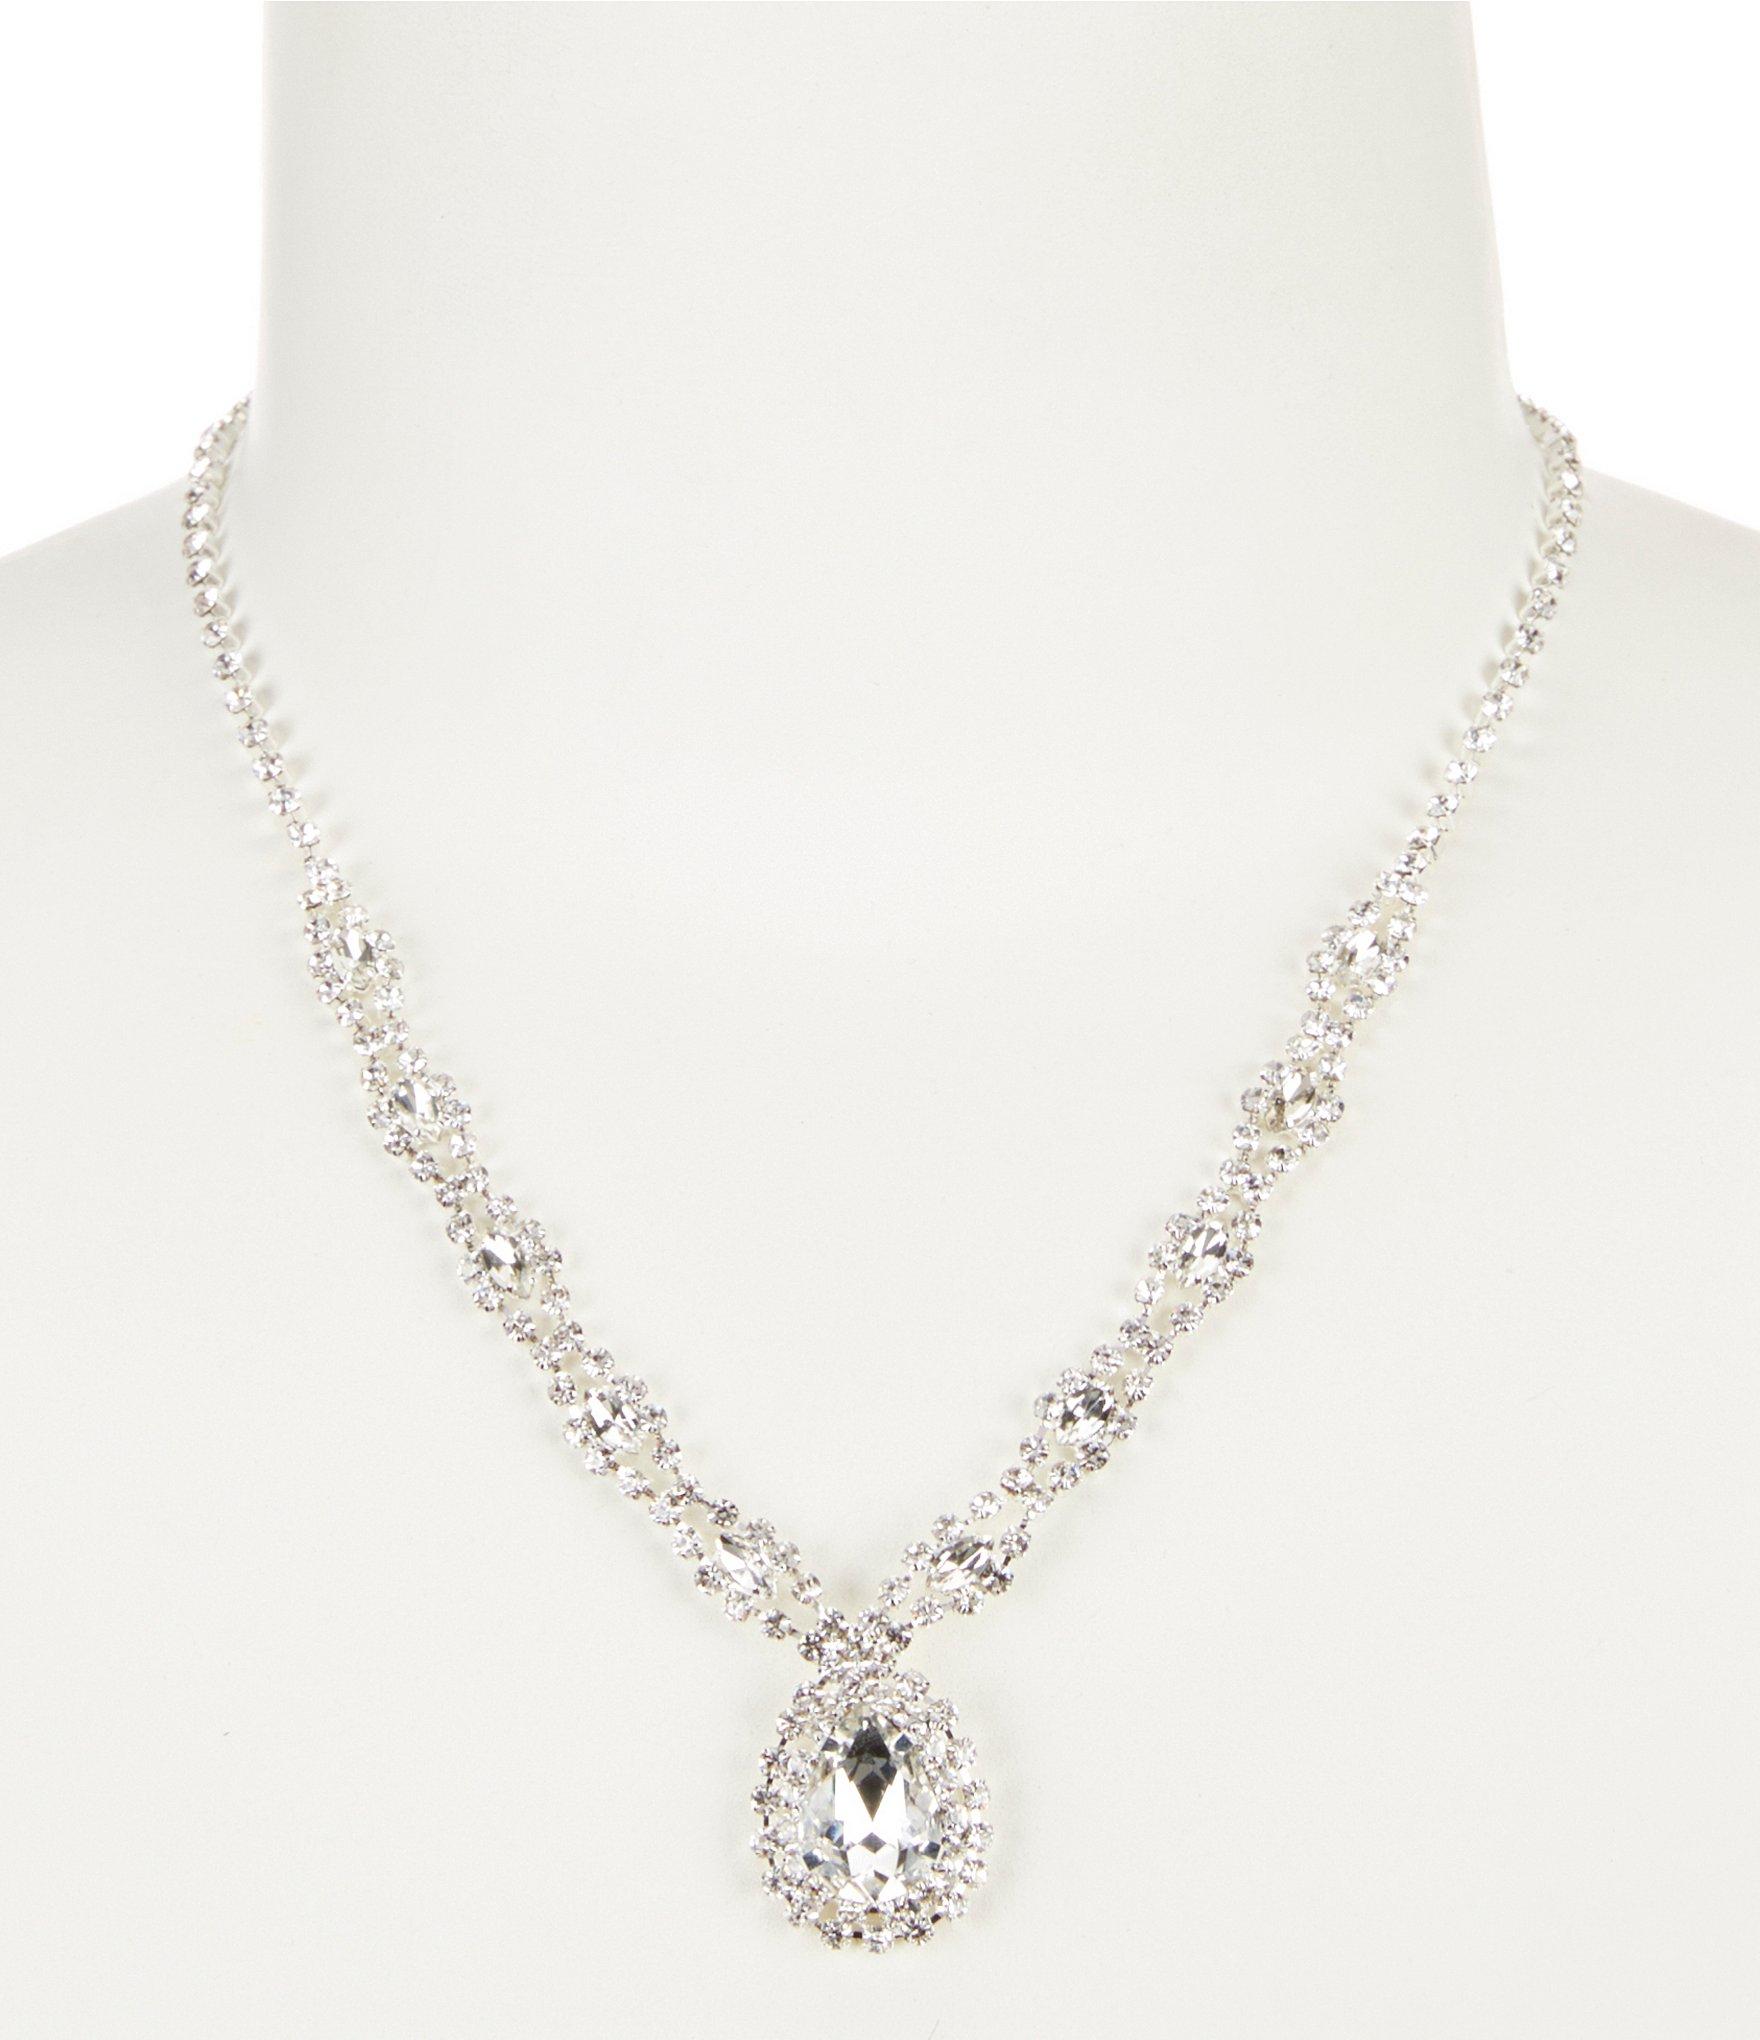 Cezanne Teardrop Weave Collar Necklace Regarding Newest Sparkling Teardrop Chandelier Pendant Necklaces (Gallery 22 of 25)